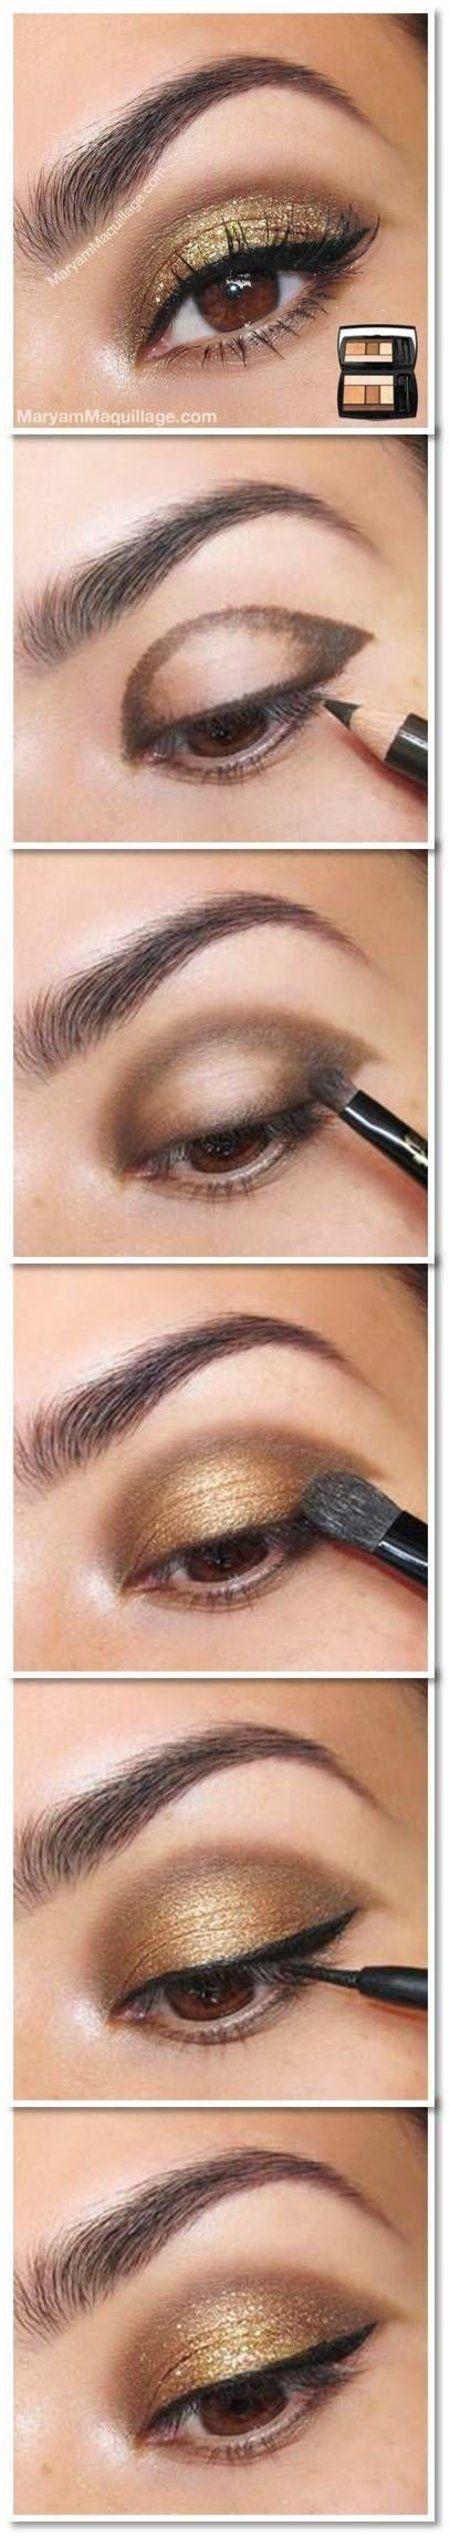 HOW TO: Gold glitter eye look Mary Kay mineral eye color Amber Blaze, Sienna or Cinnabar black liquid eyeliner